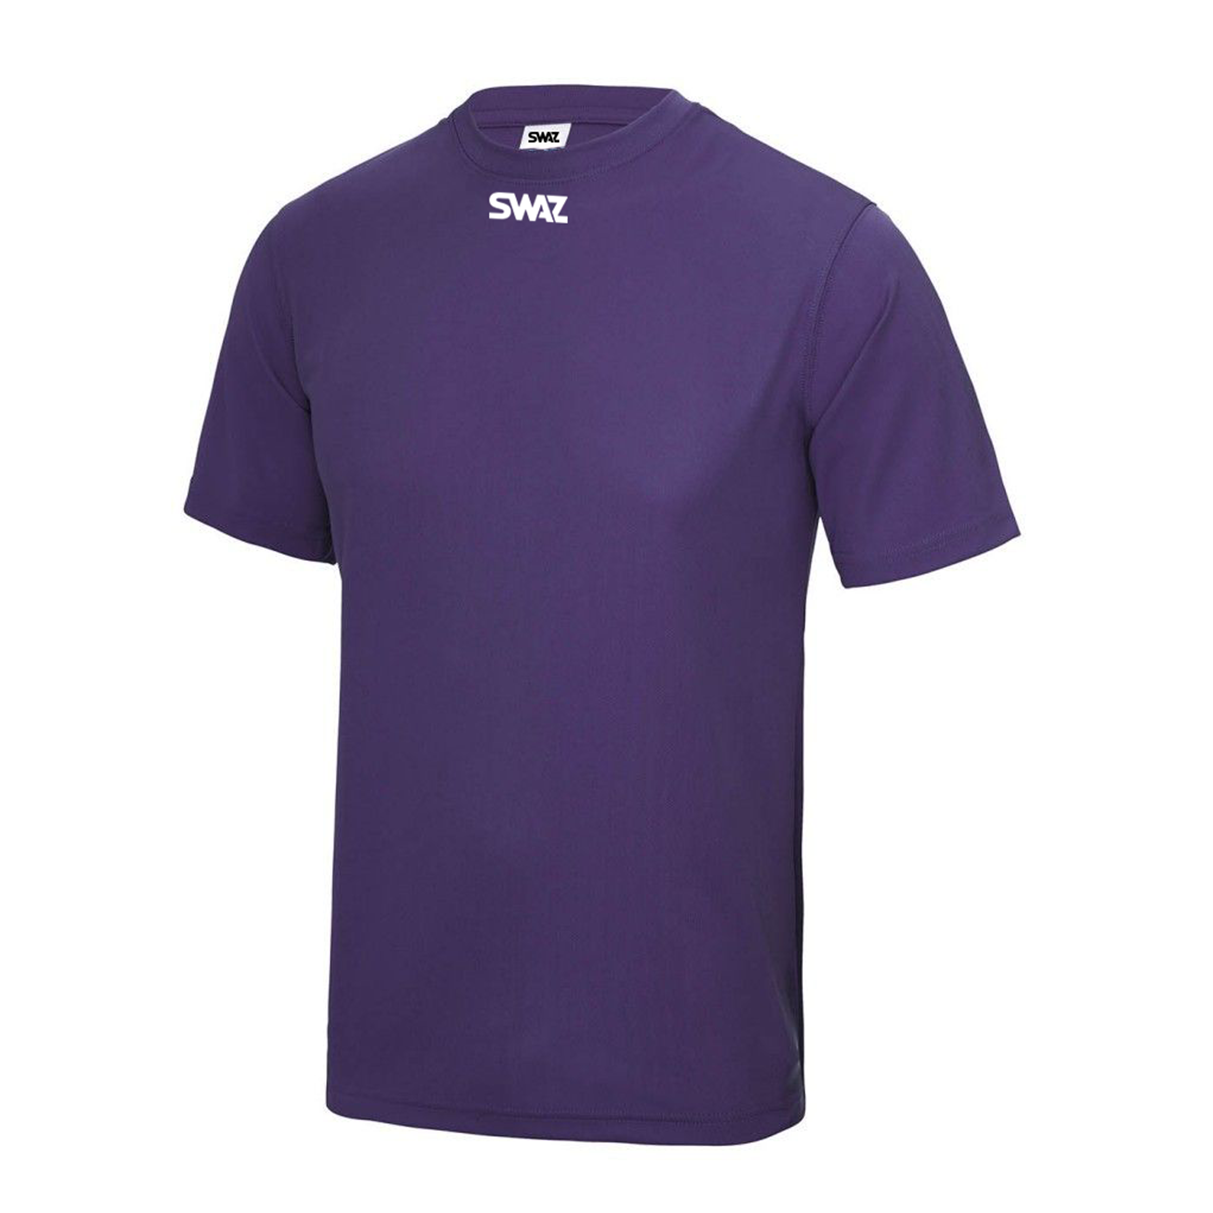 SWAZ Youth Club Training T-Shirt – Royal